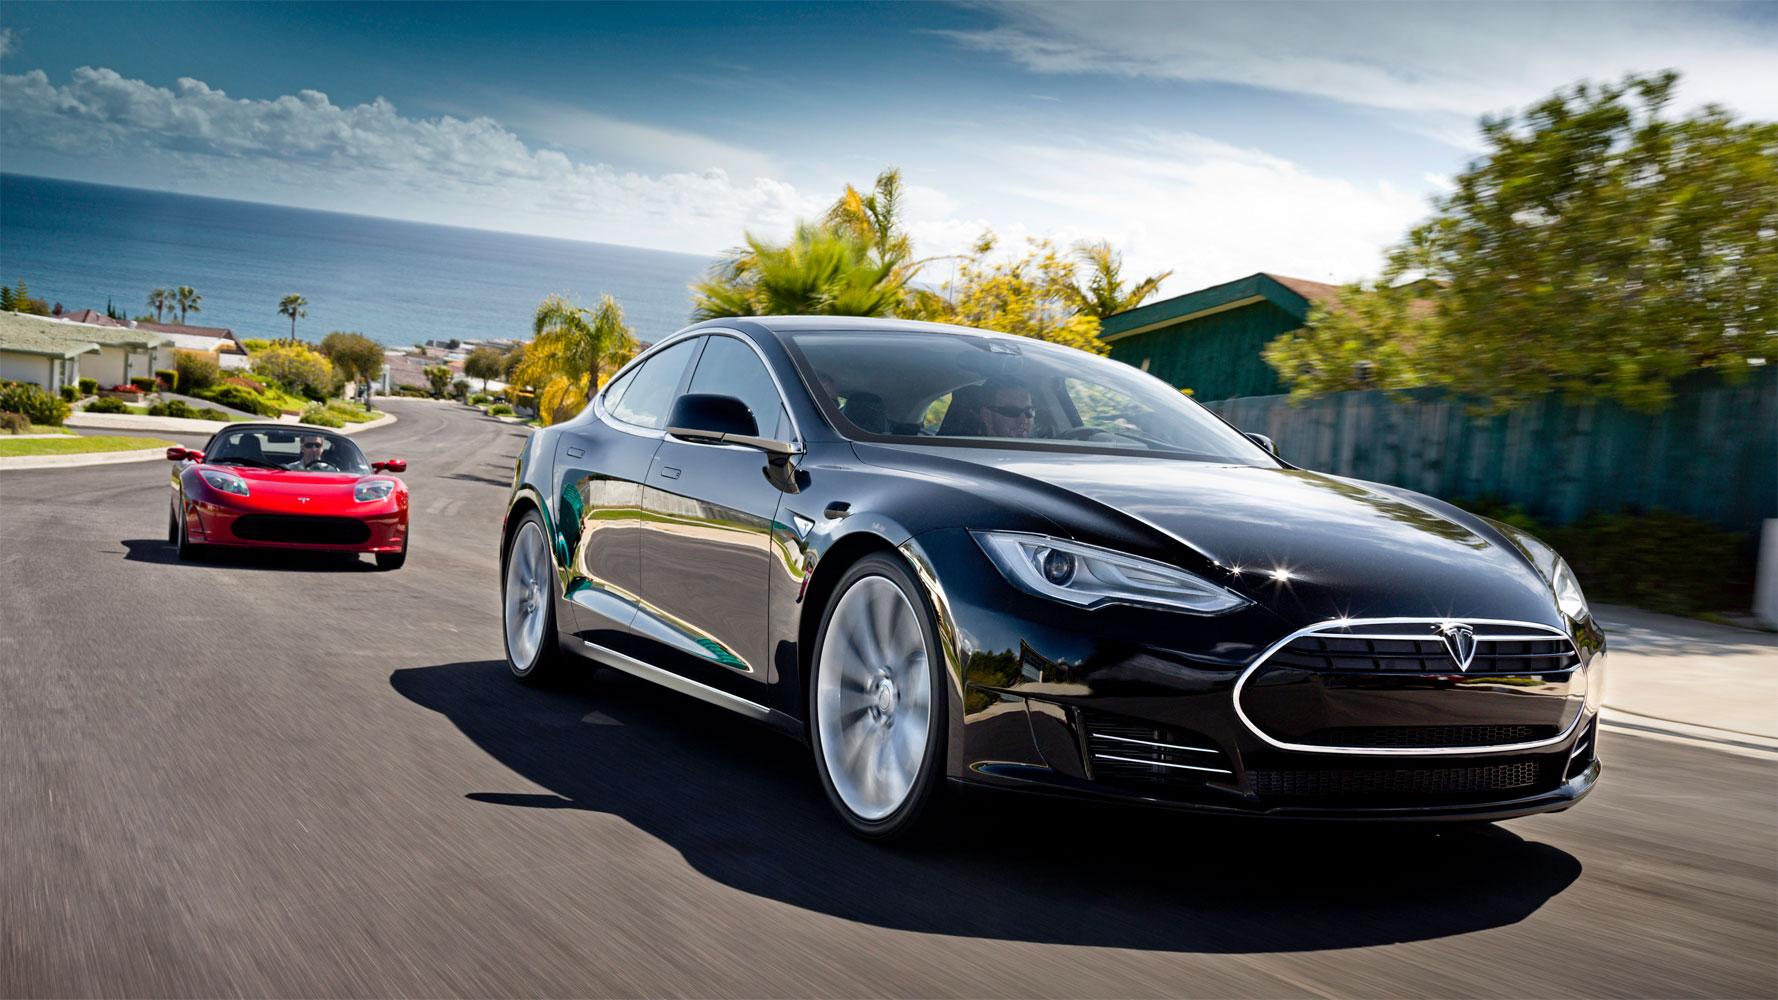 Shai Agassis vier Lehren aus dem Erfolg Teslas